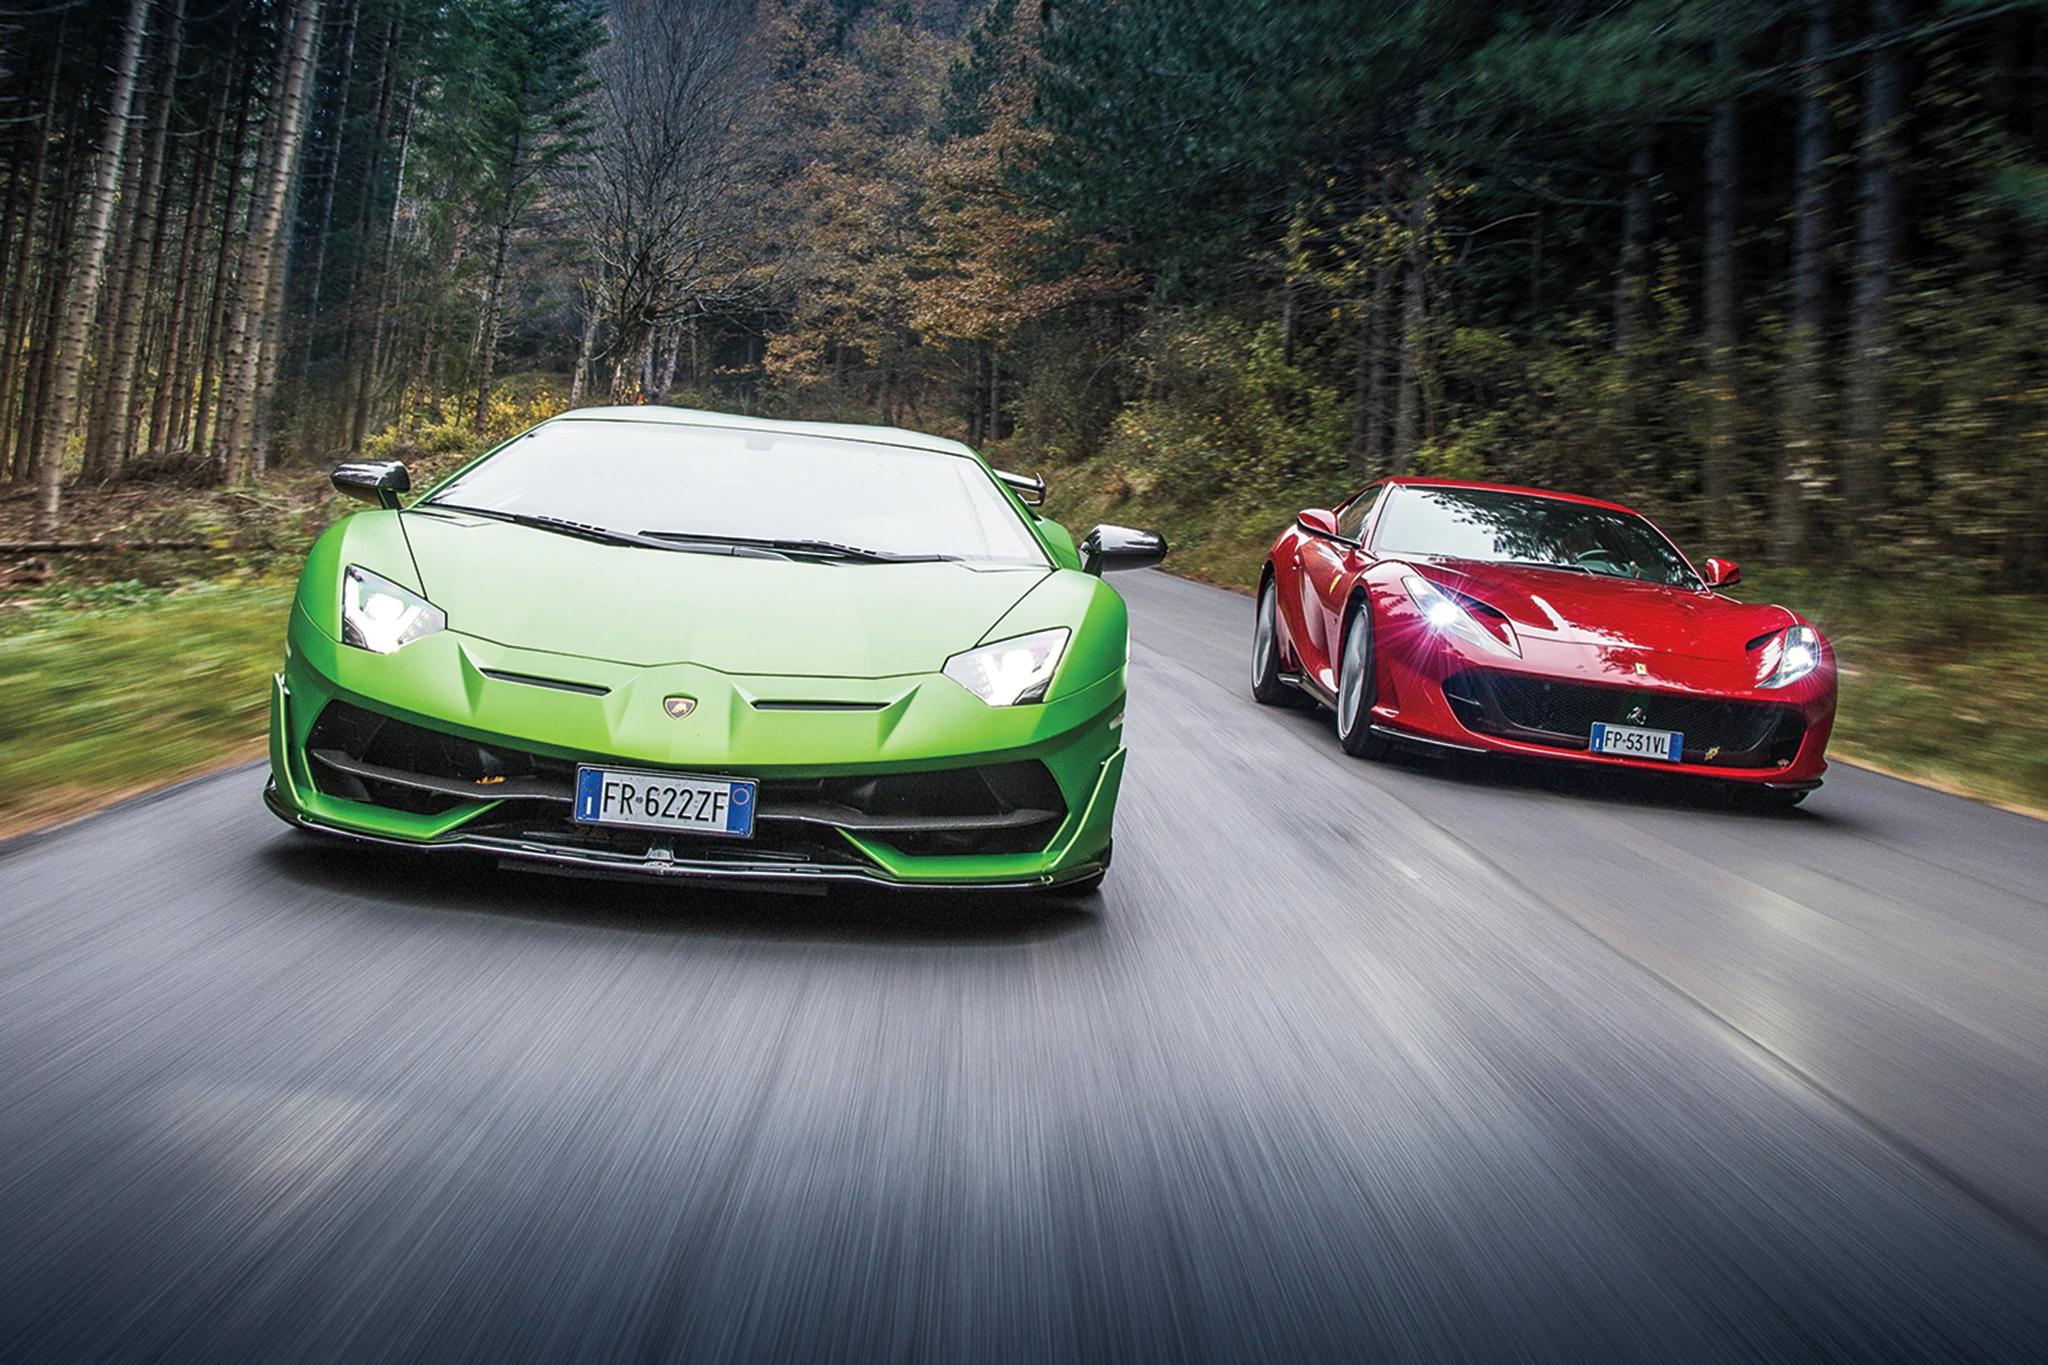 فيراري ولامبورجيني مُقلدة , مُقلدة , مصنع , سيارات , البرازيل , فيراري , Ferrari , لامبورجيني , Lamborghini